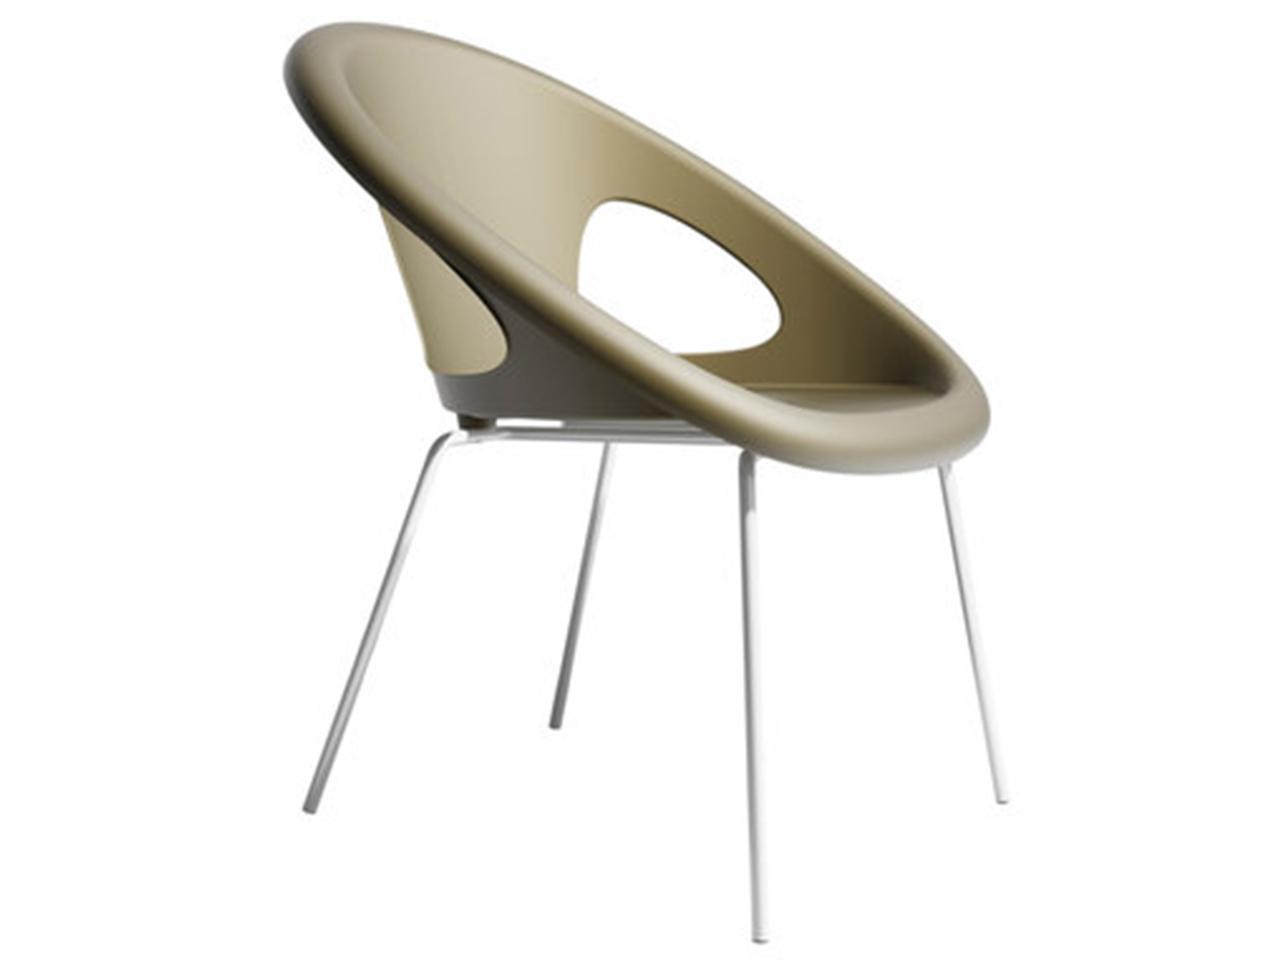 Кресло пластиковое Drop 4 legs coated frame